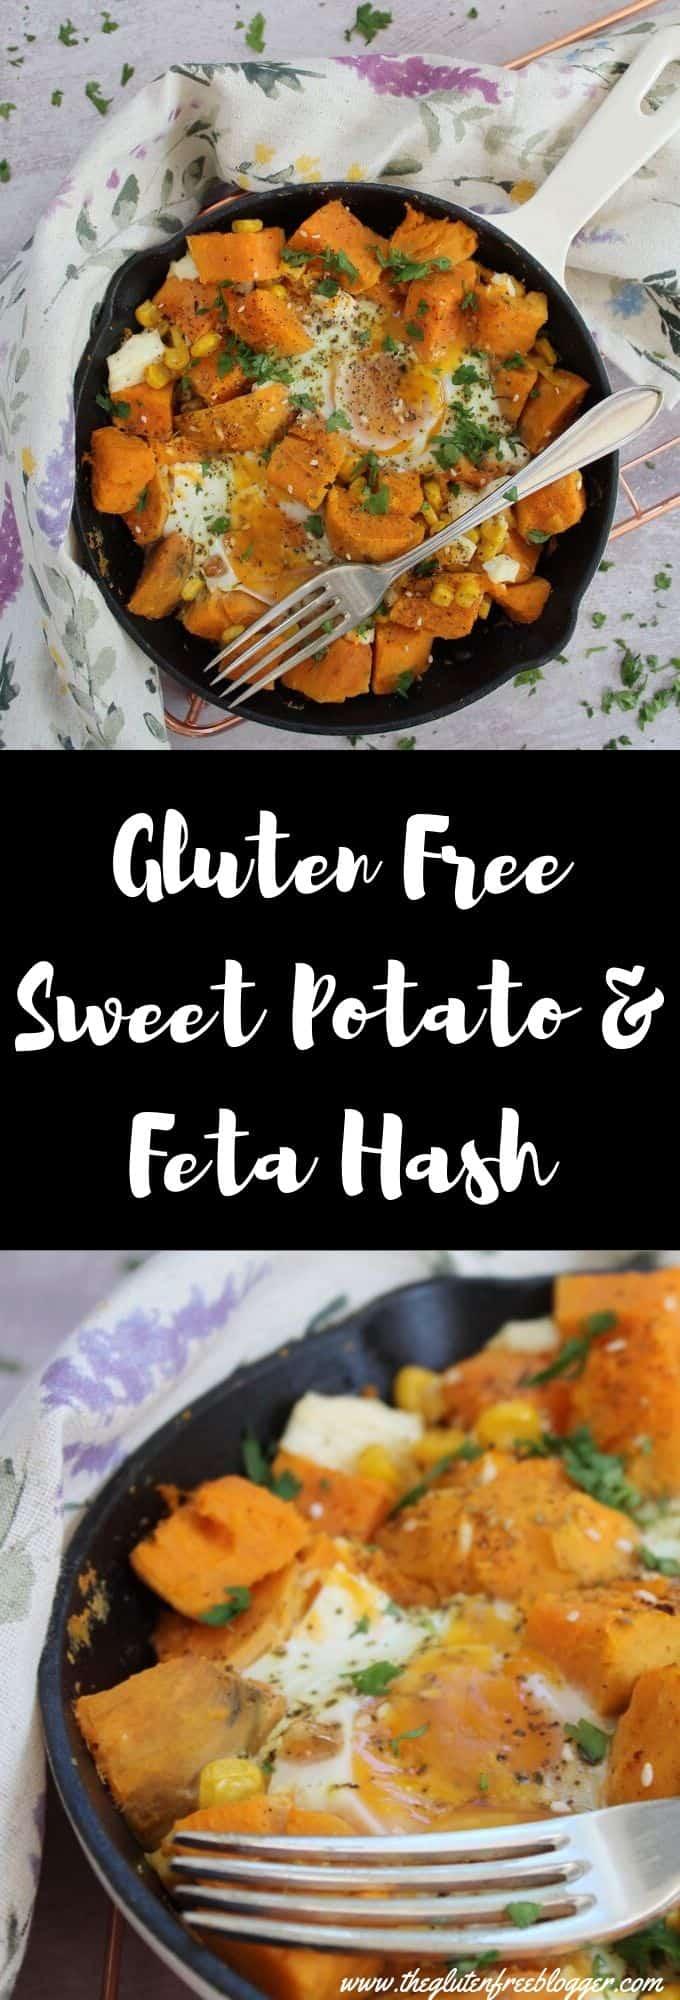 gluten free sweet potato and feta hash coeliac brunch dinner idea